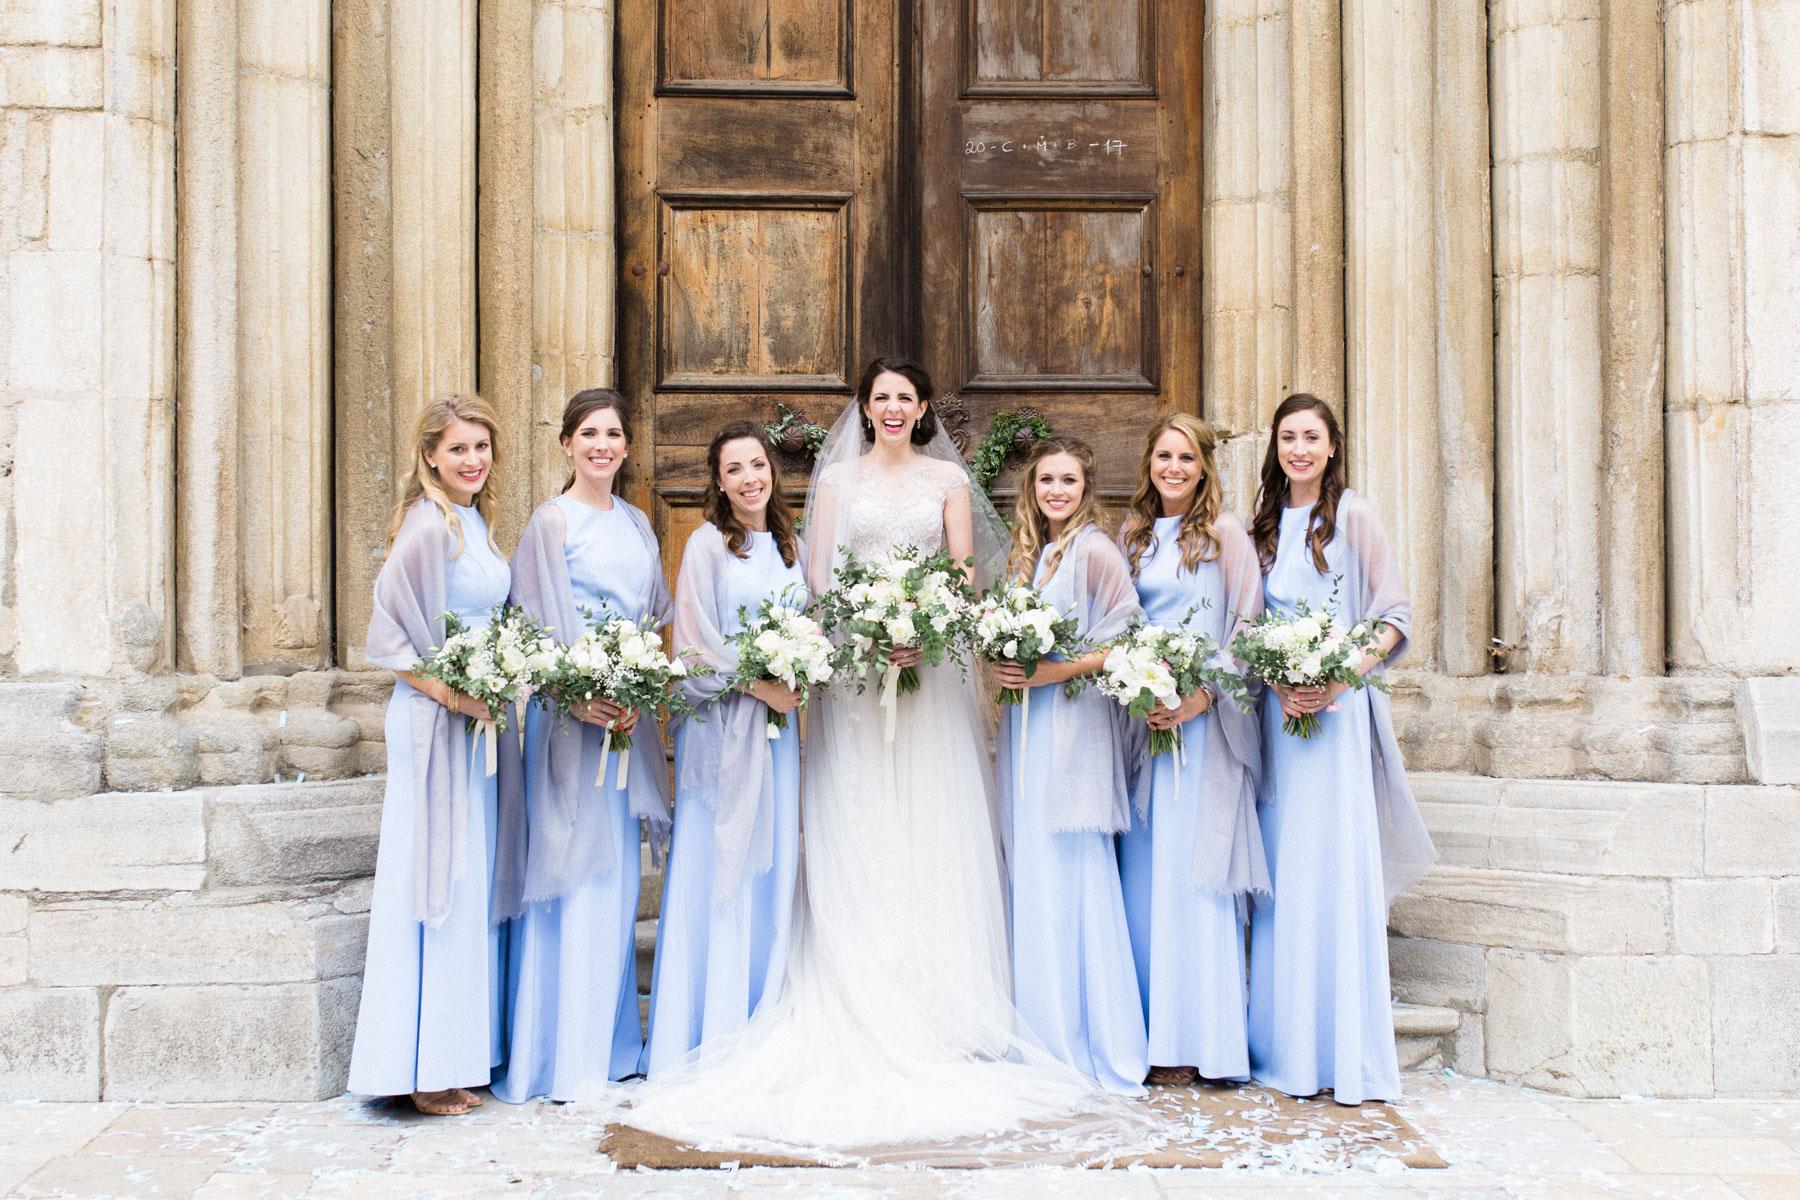 Kelli & Rene || An Austrian American Summer Wedding